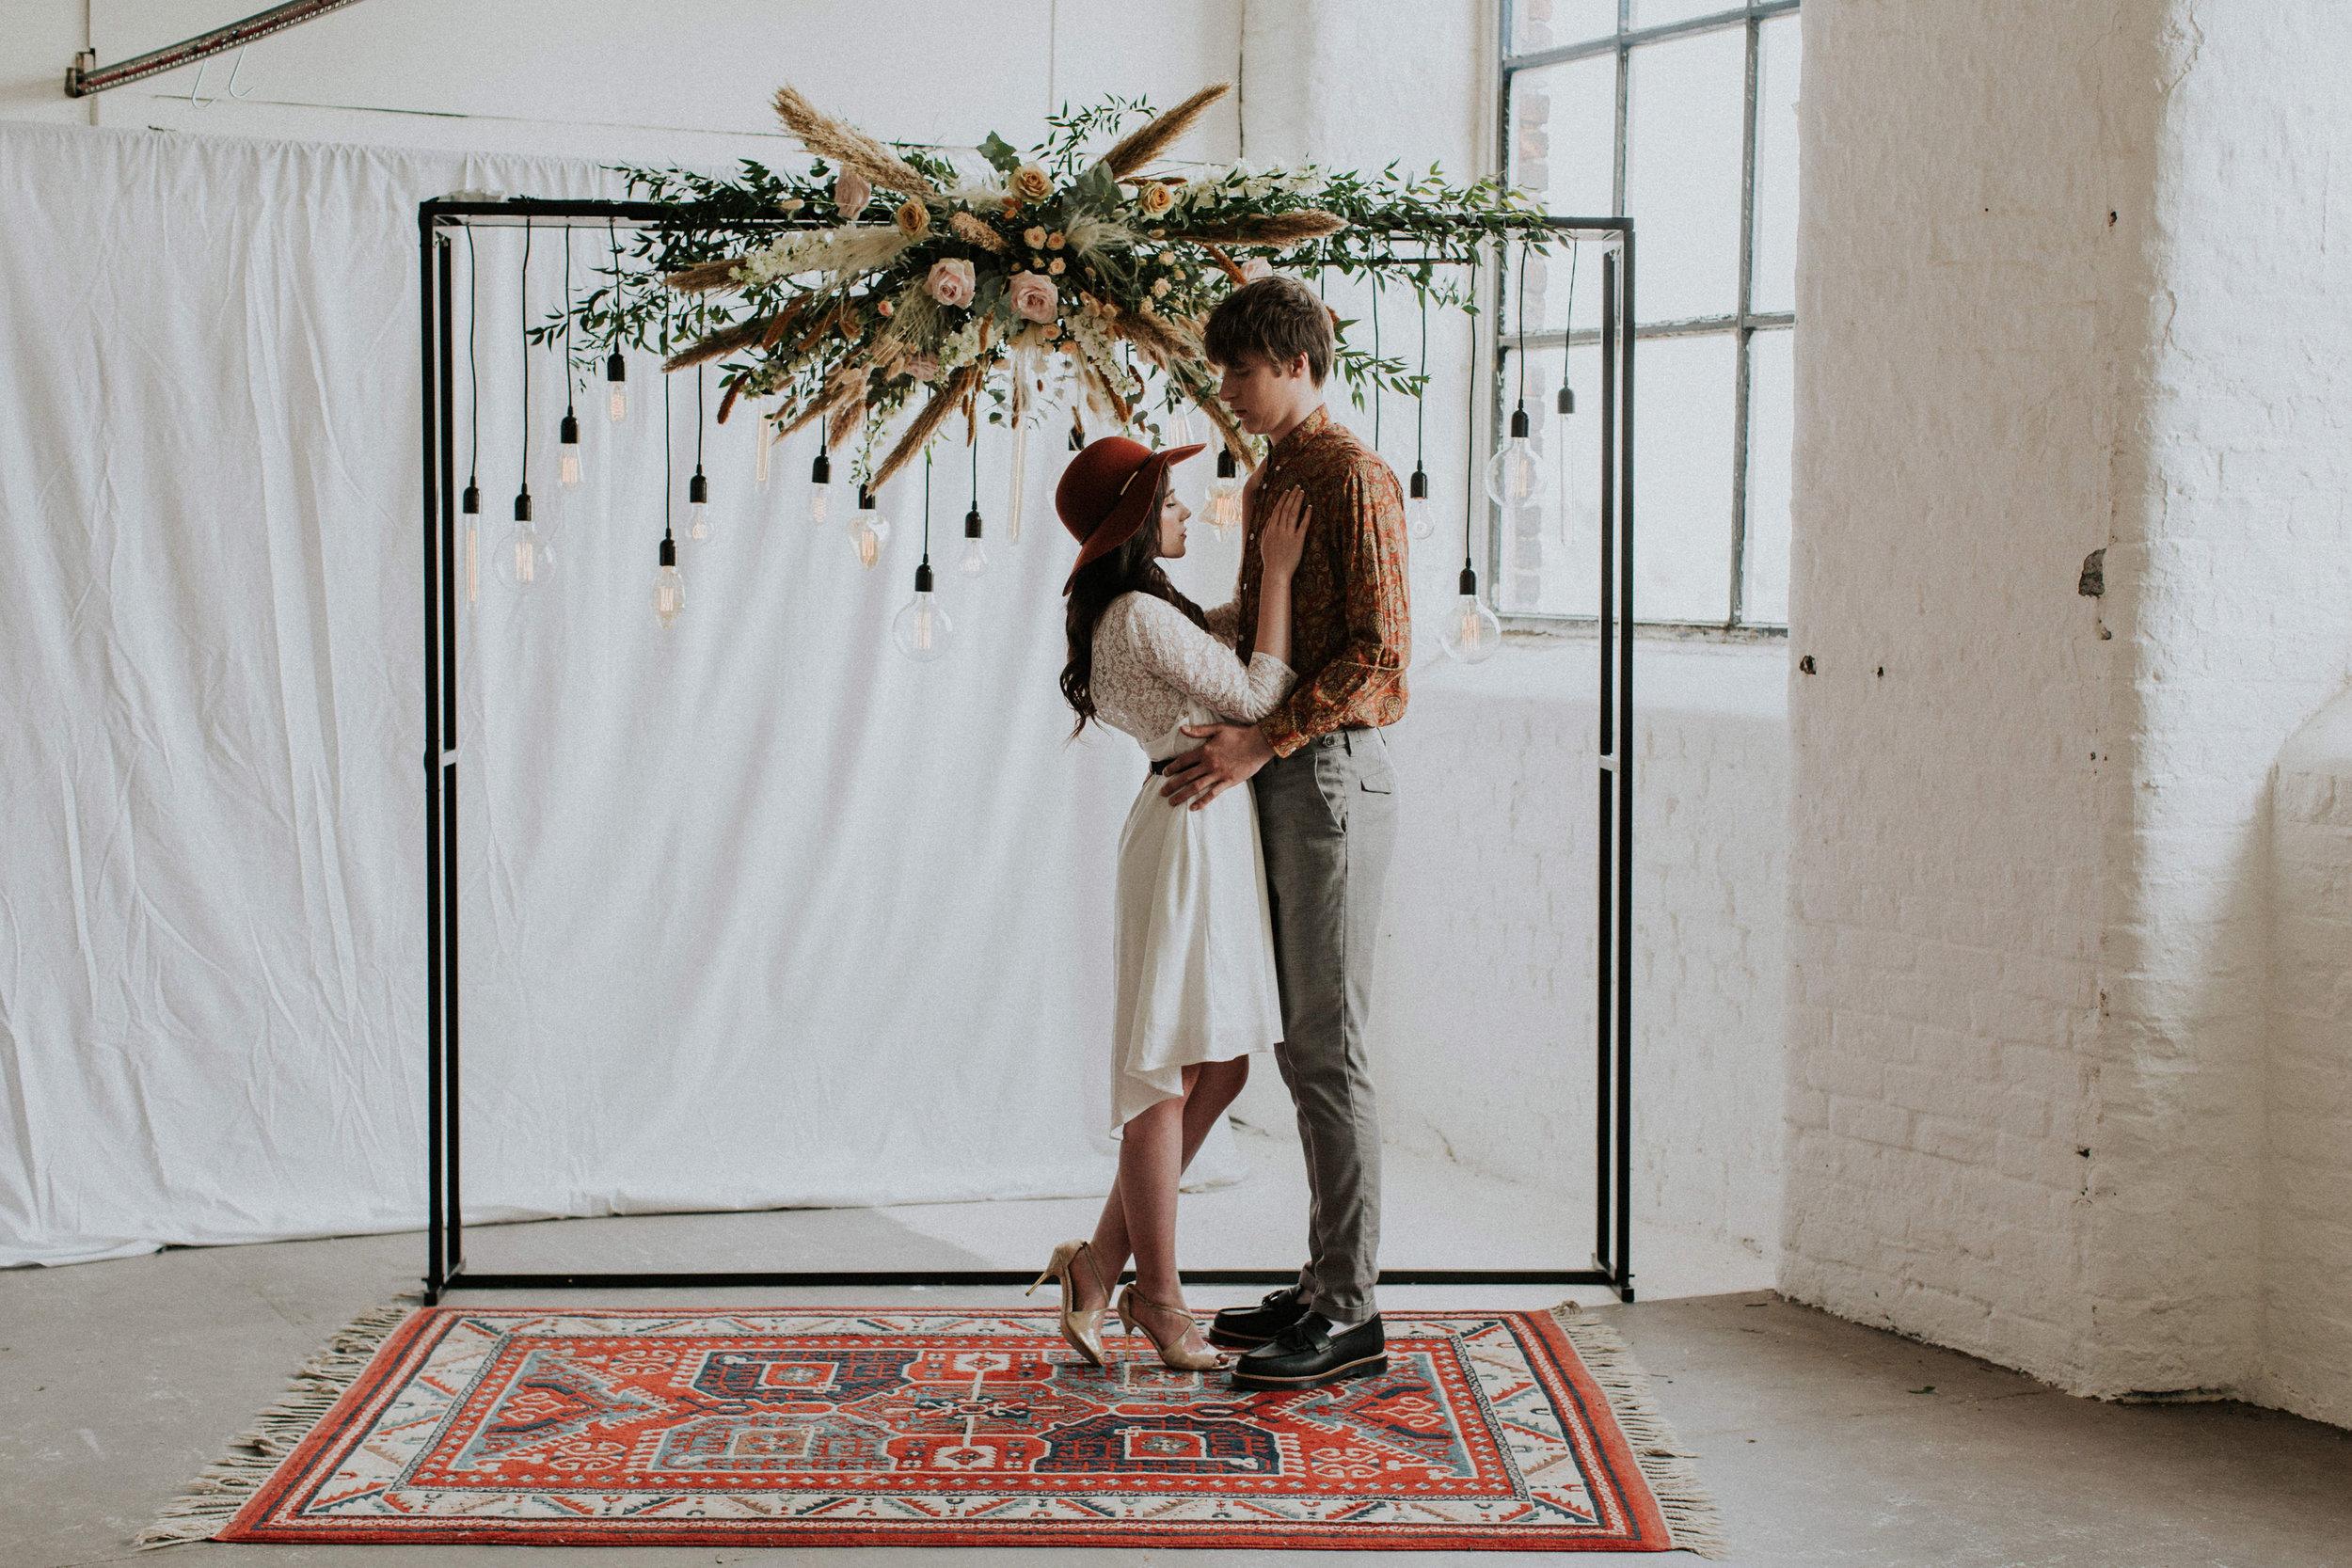 eco friendly wedding dress the conscious bride vegan.jpeg